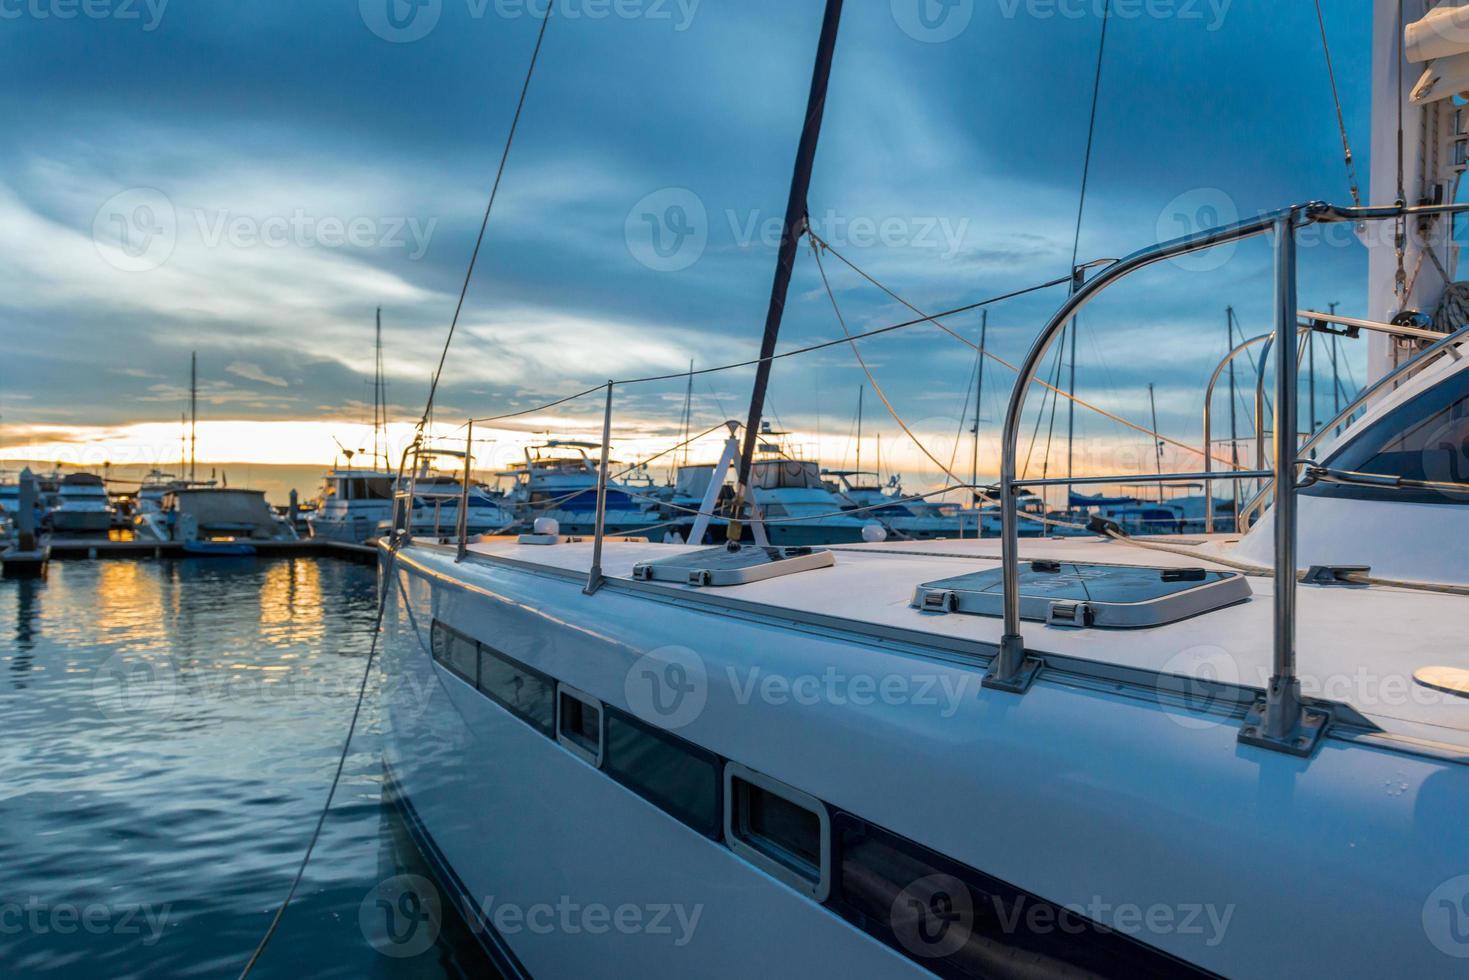 Empty catamaran yacht deck sailing on the sea photo